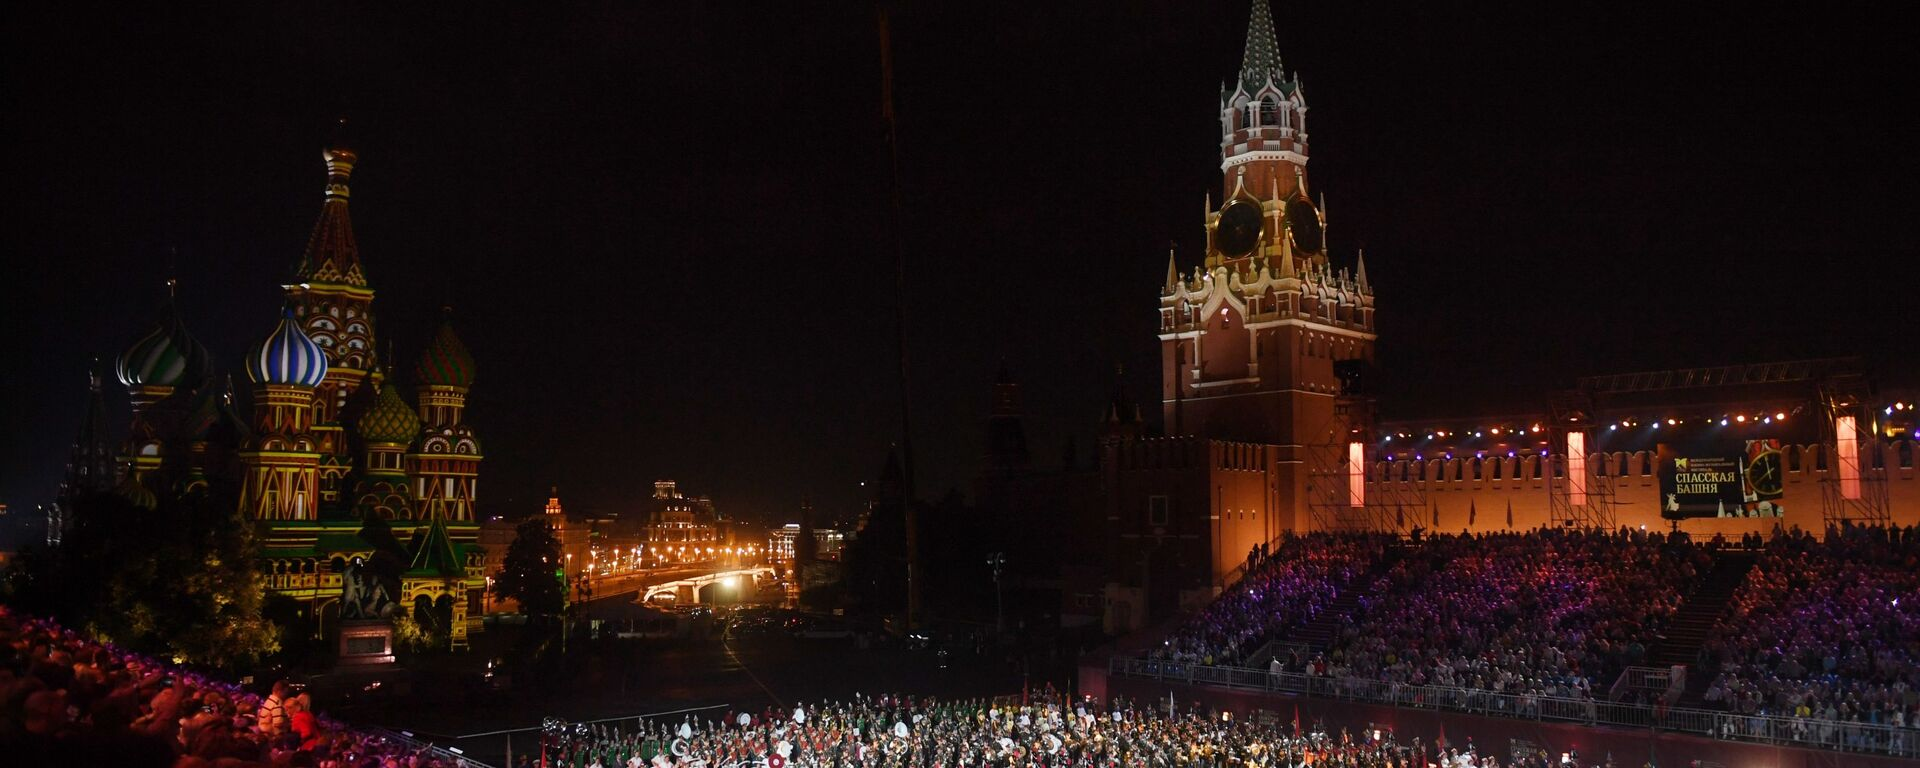 Así culminó el Festival Internacional de Música Militar Torre Spásskaya - Sputnik Mundo, 1920, 03.08.2021